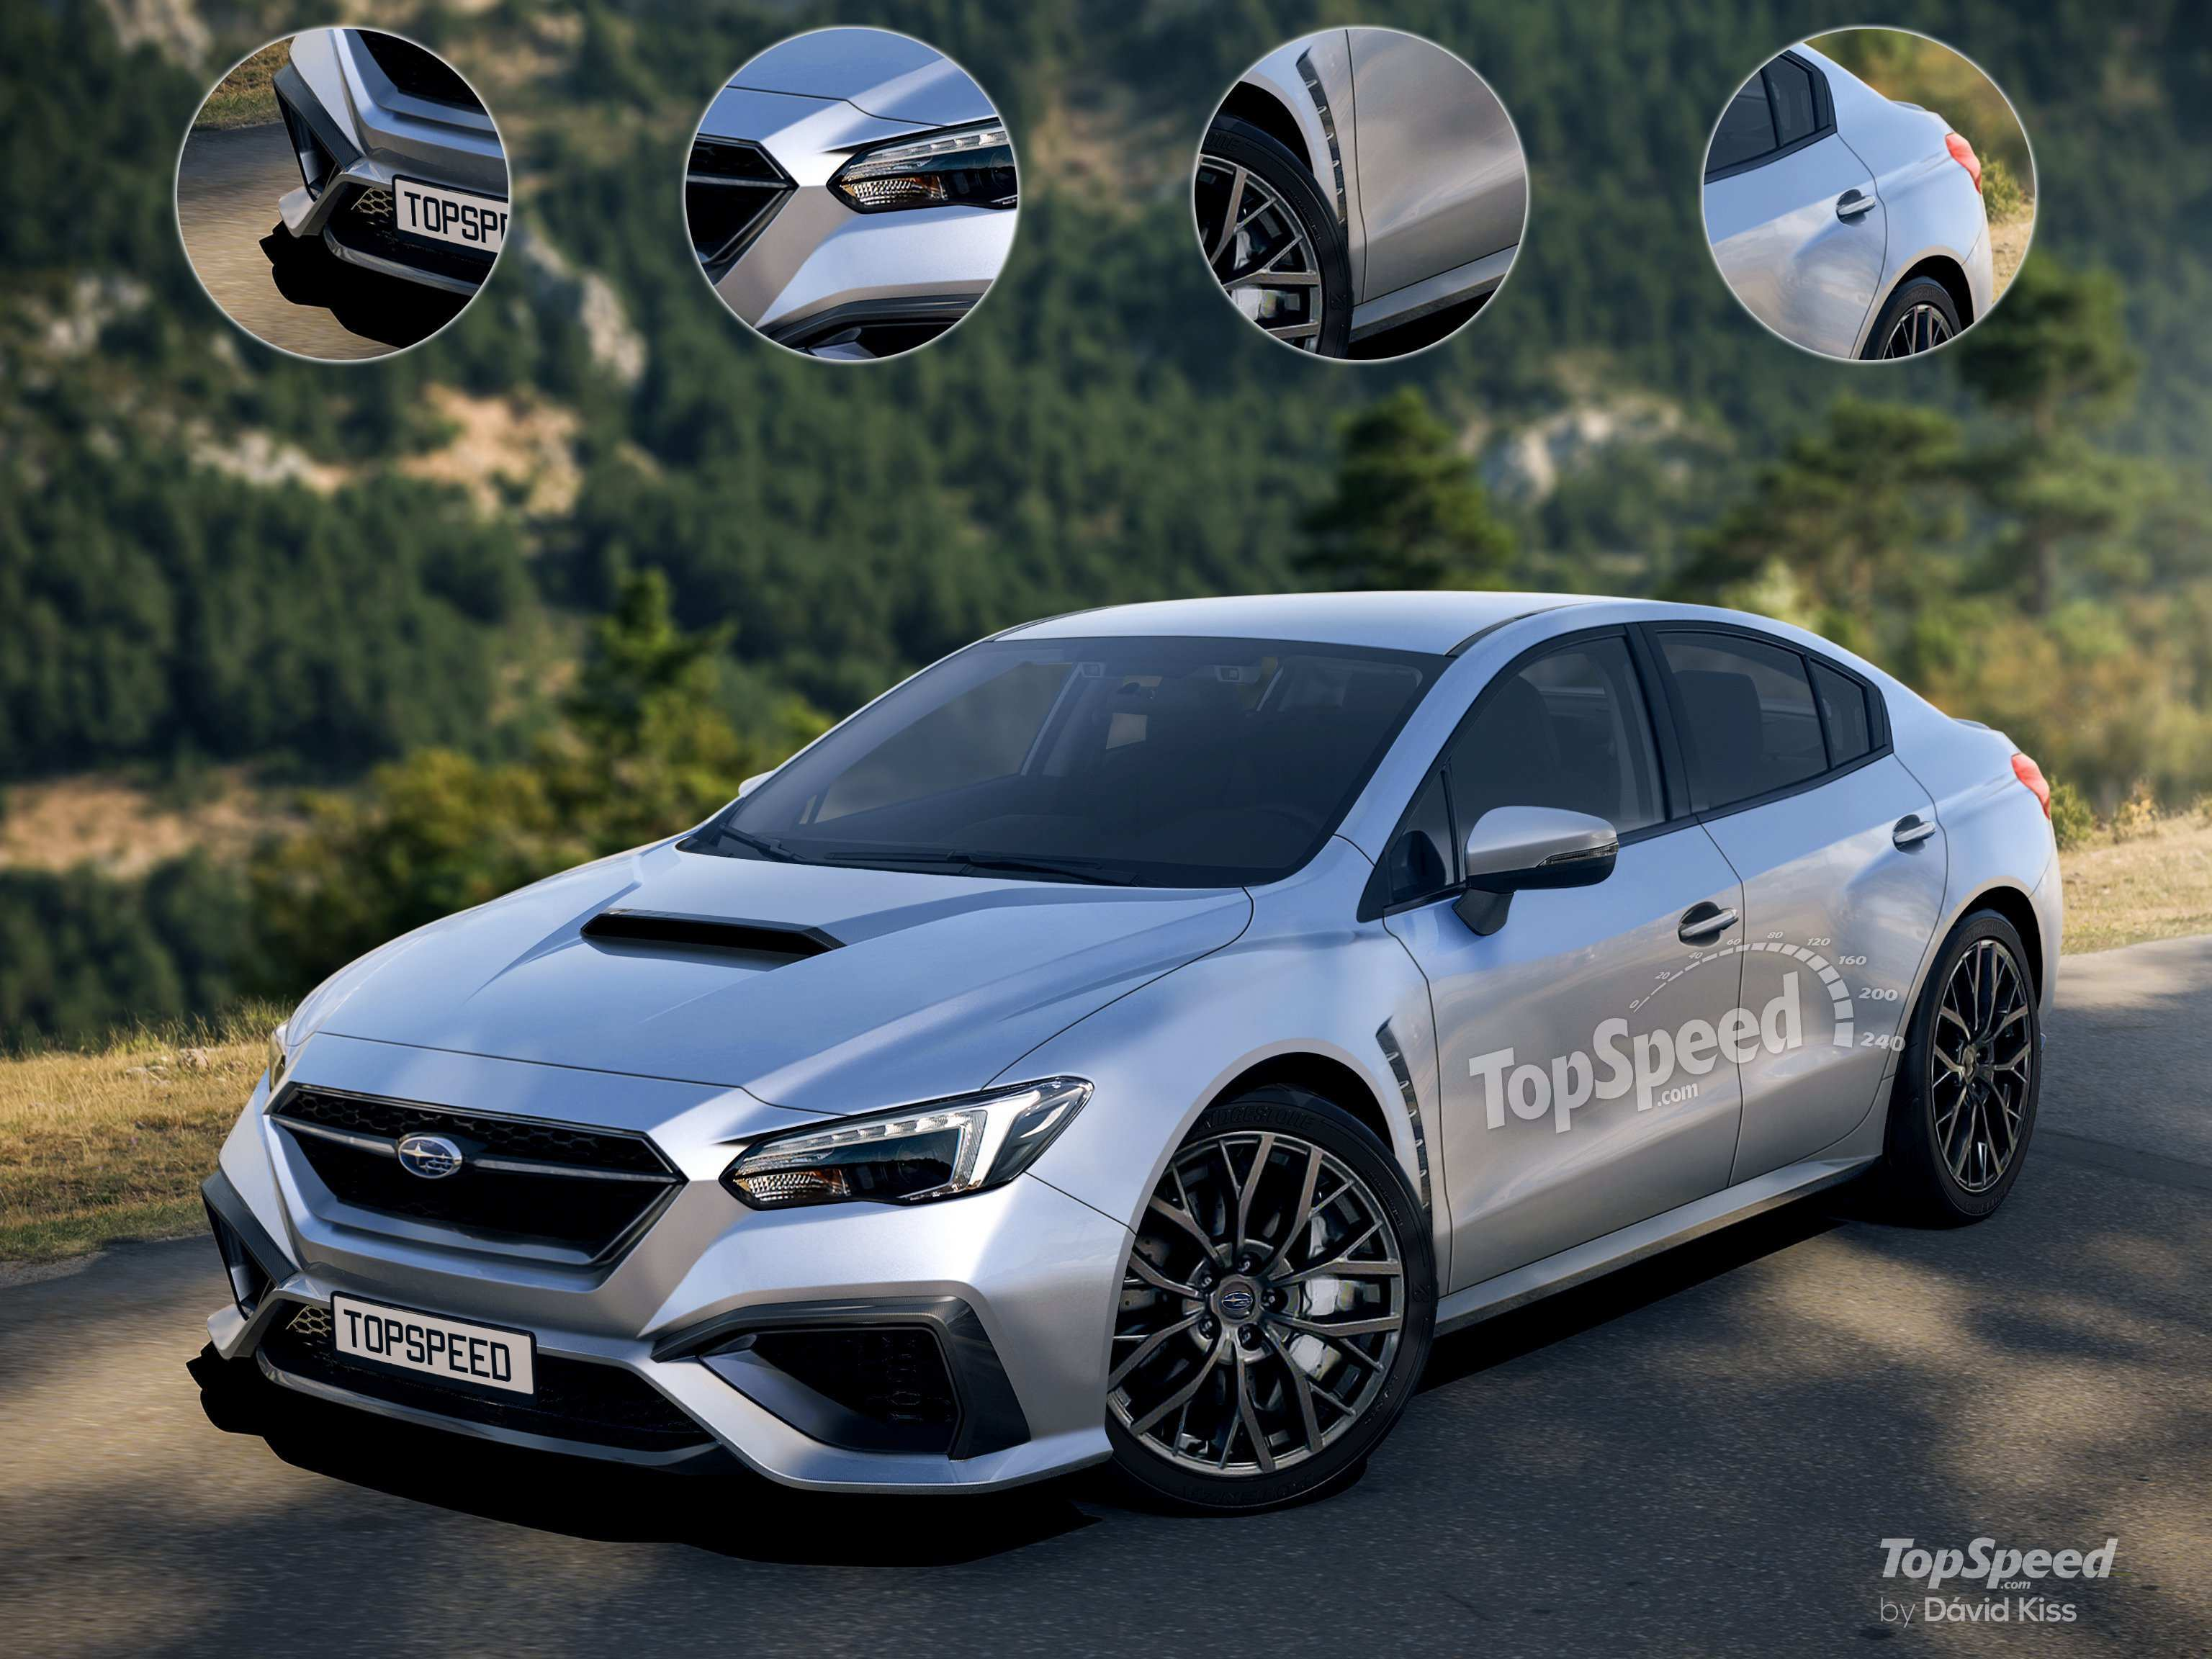 33 Great Subaru 2020 Exterior Overview by Subaru 2020 Exterior